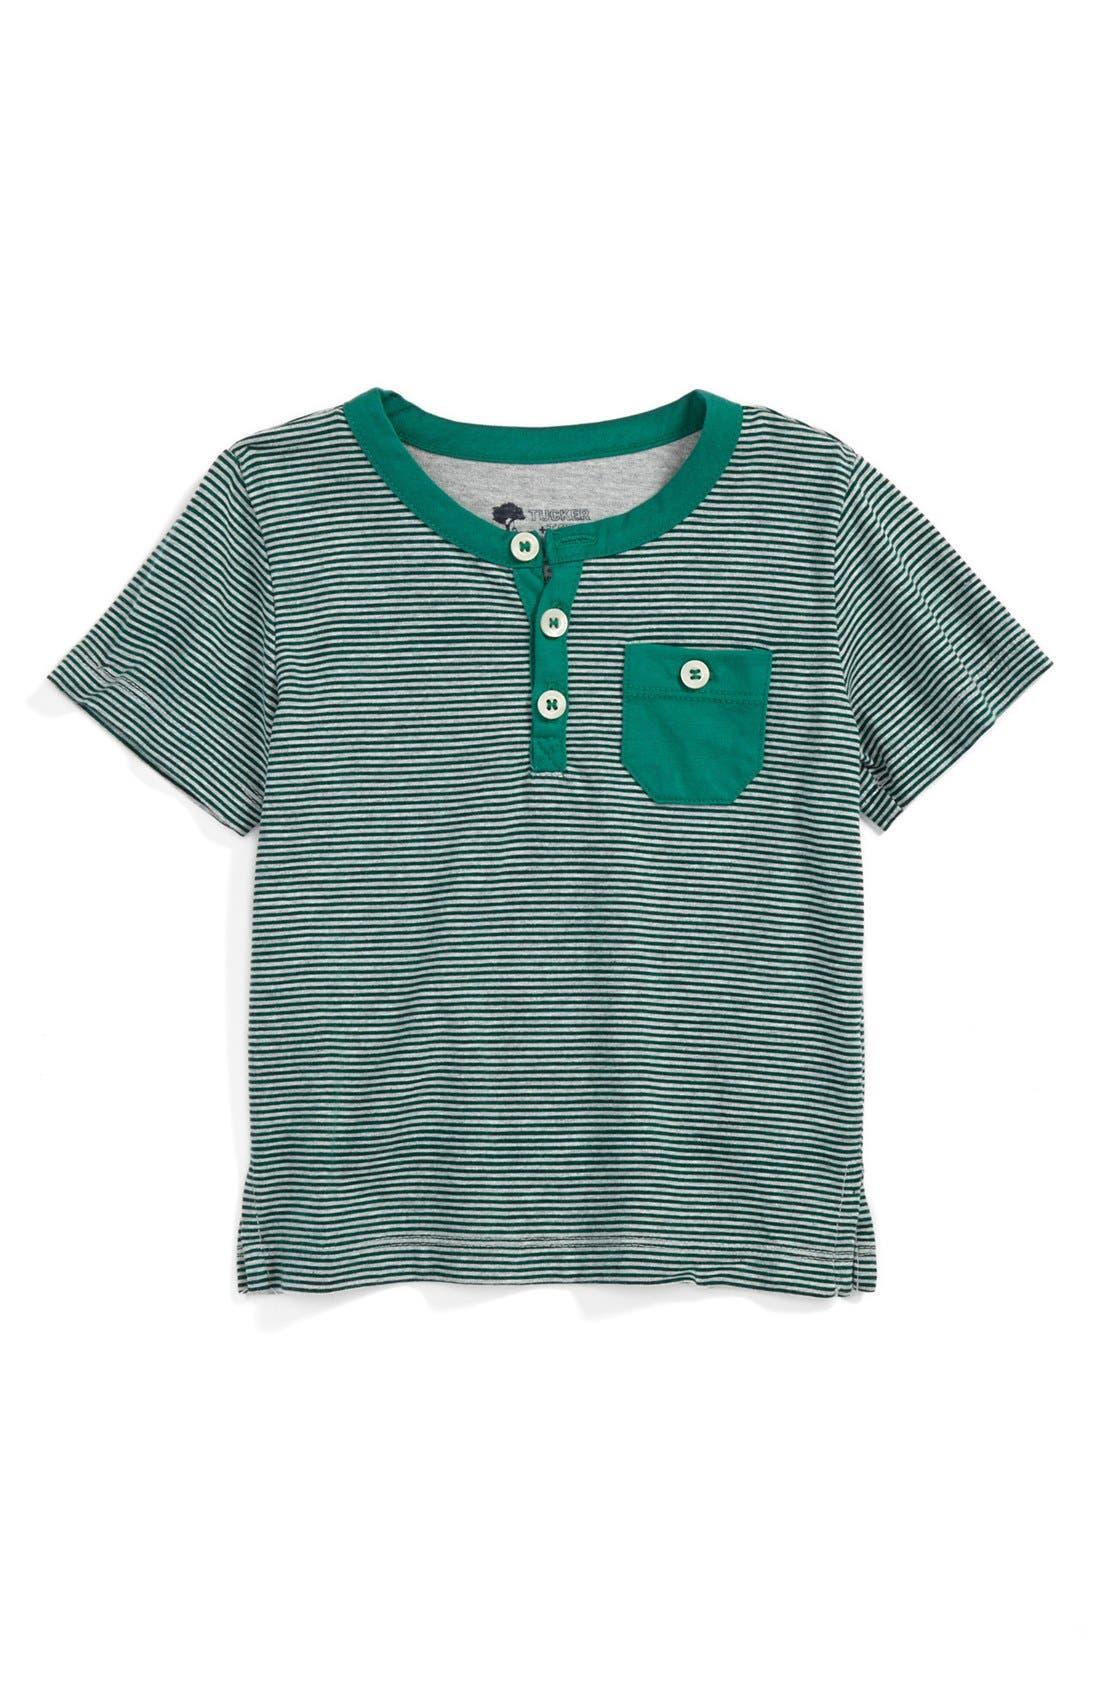 Main Image - Tucker + Tate 'Parker Road' Henley T-Shirt (Baby Boys)